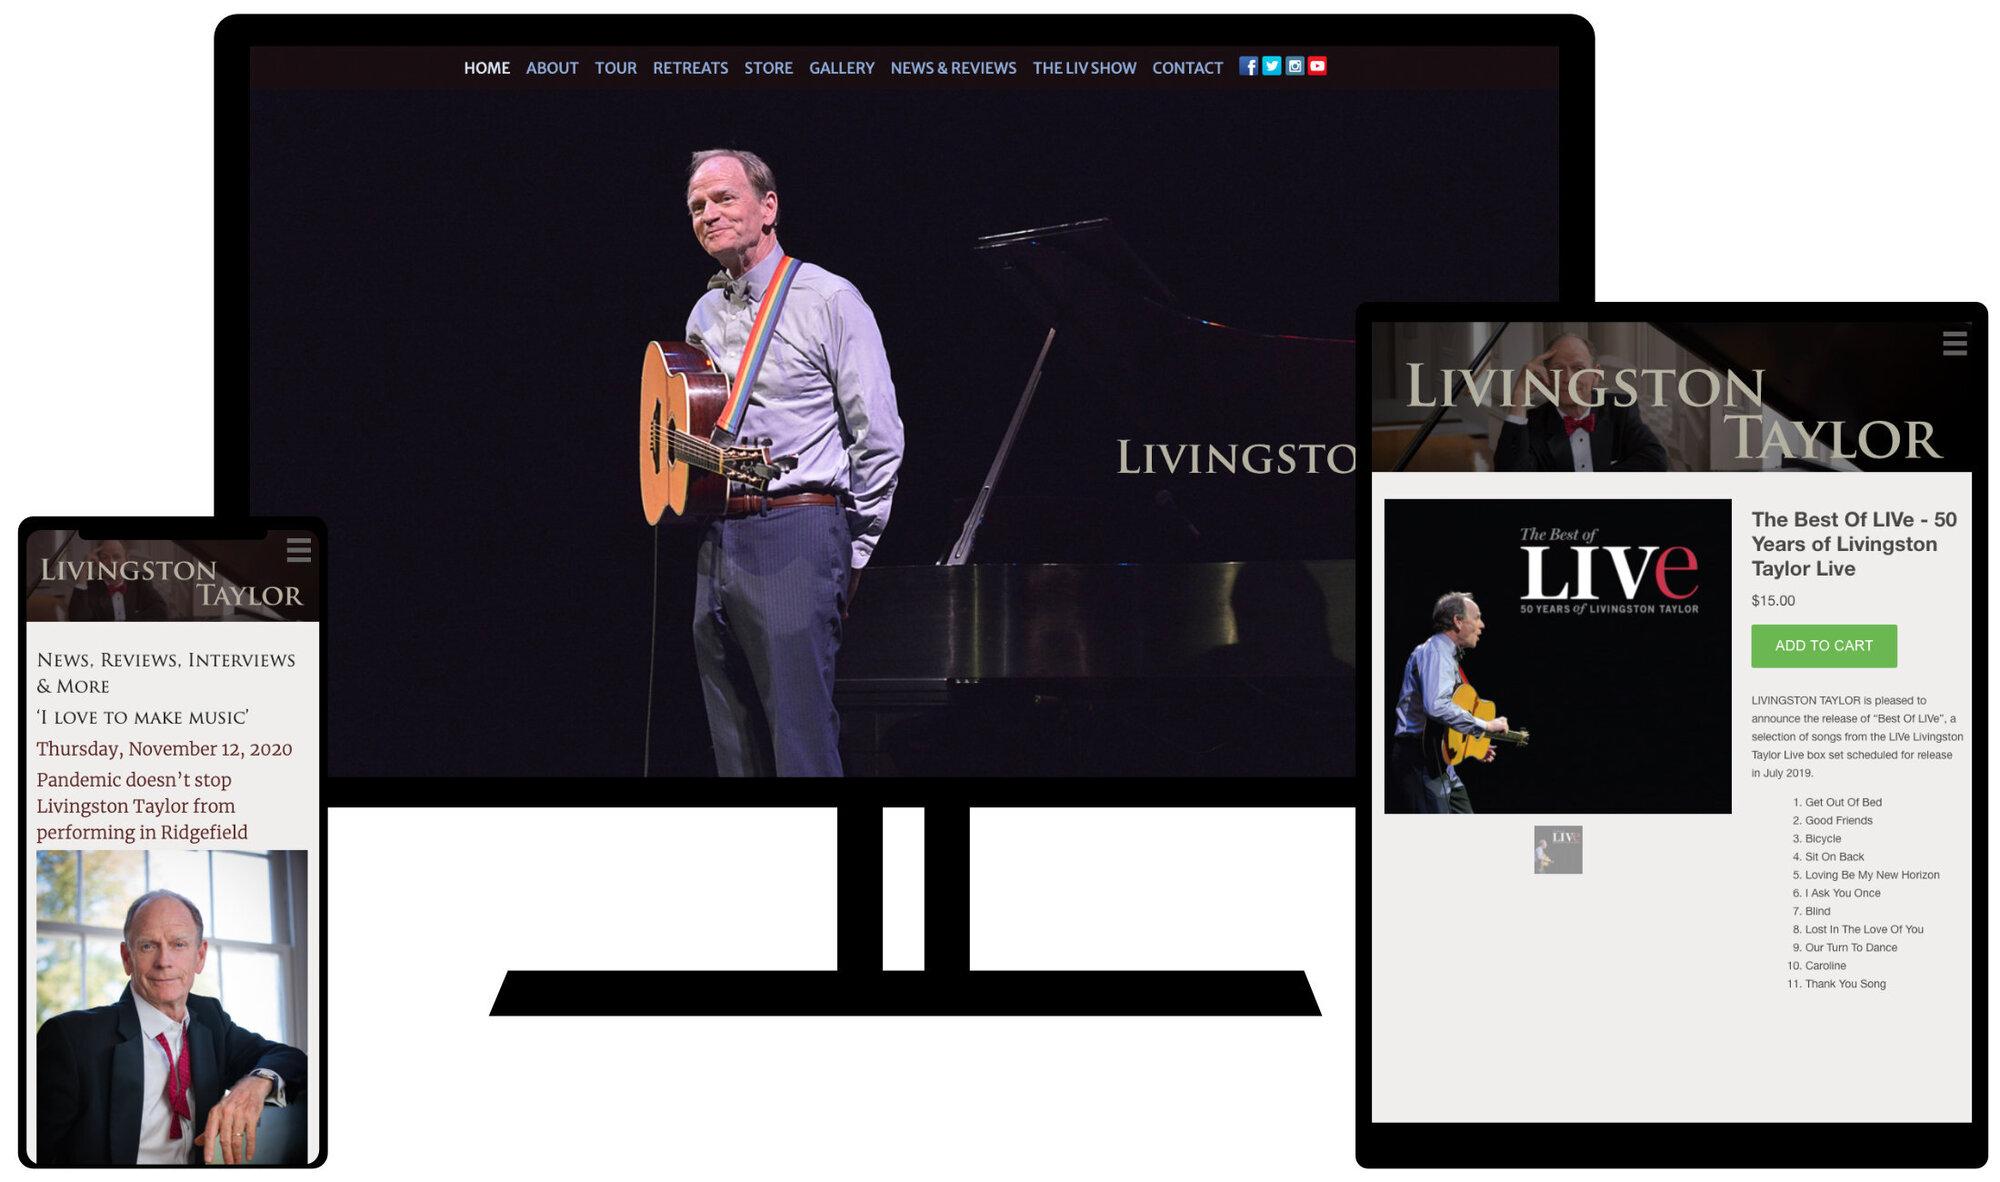 Livingston Taylor's website on multiple screens